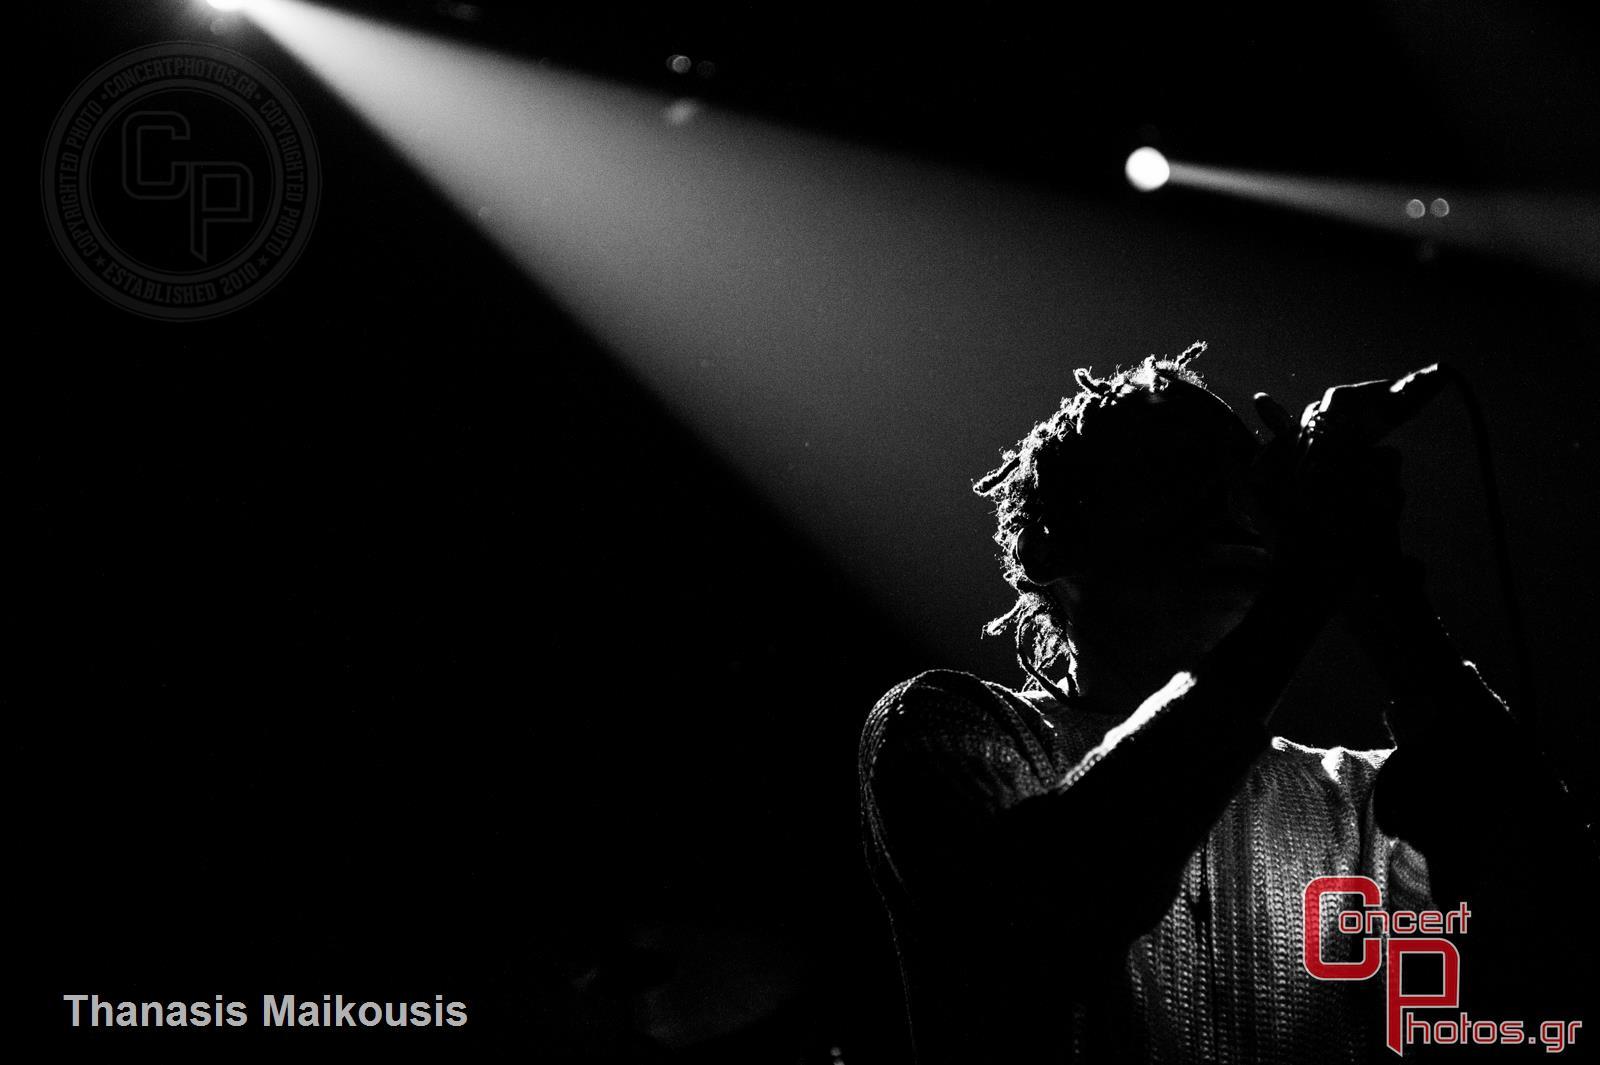 Tricky - Spectralfire-Tricky - Spectralfire photographer: Thanasis Maikousis - concertphotos_-3738